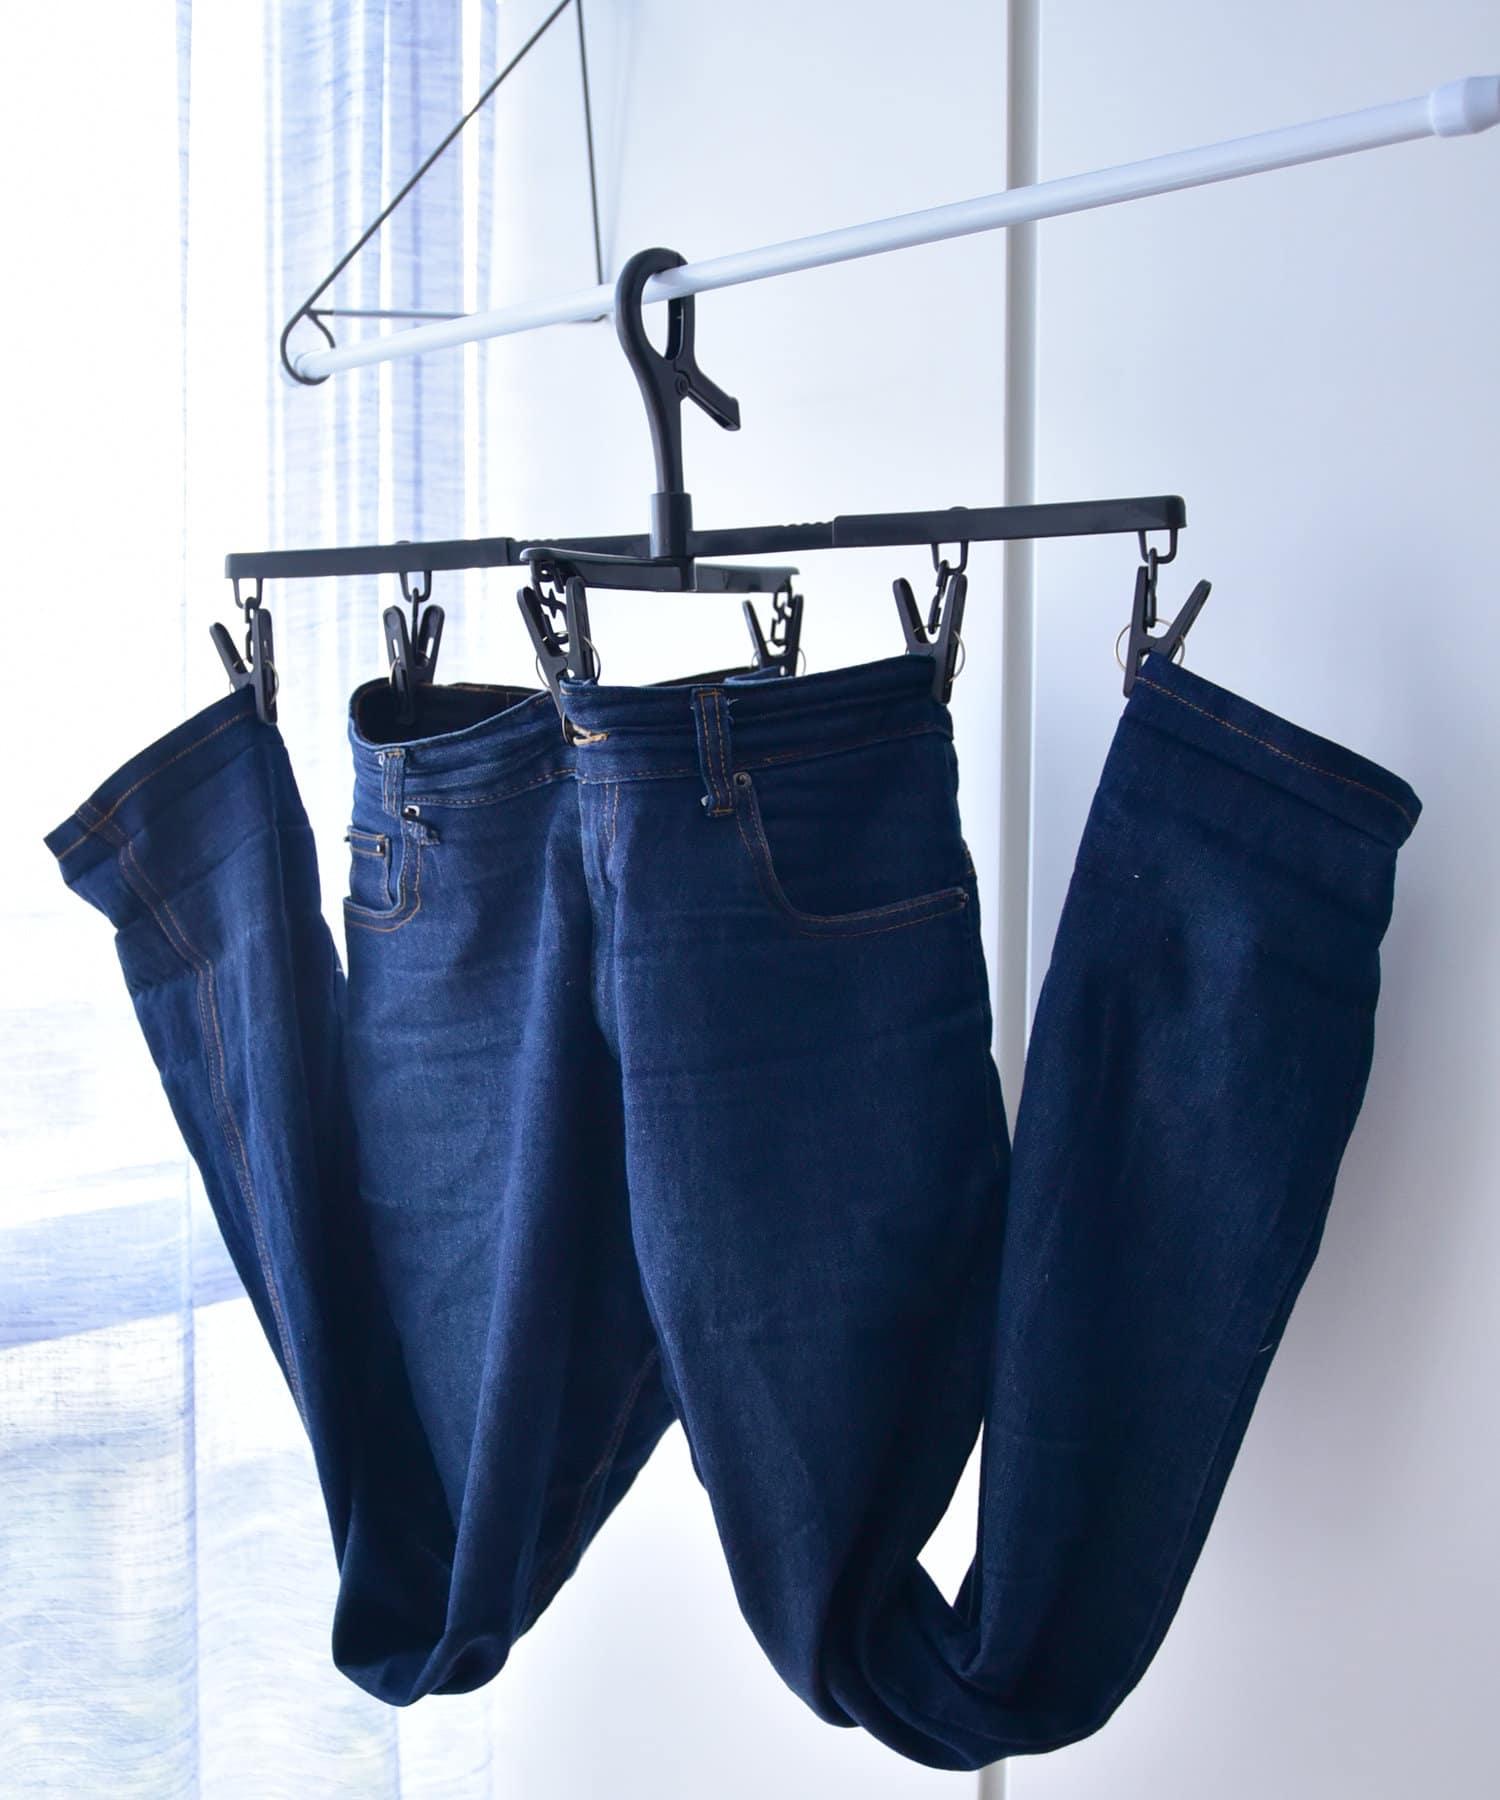 3COINS(スリーコインズ) 【梅雨でも快適】衣類が乾きやすいボトム用伸縮ハンガー